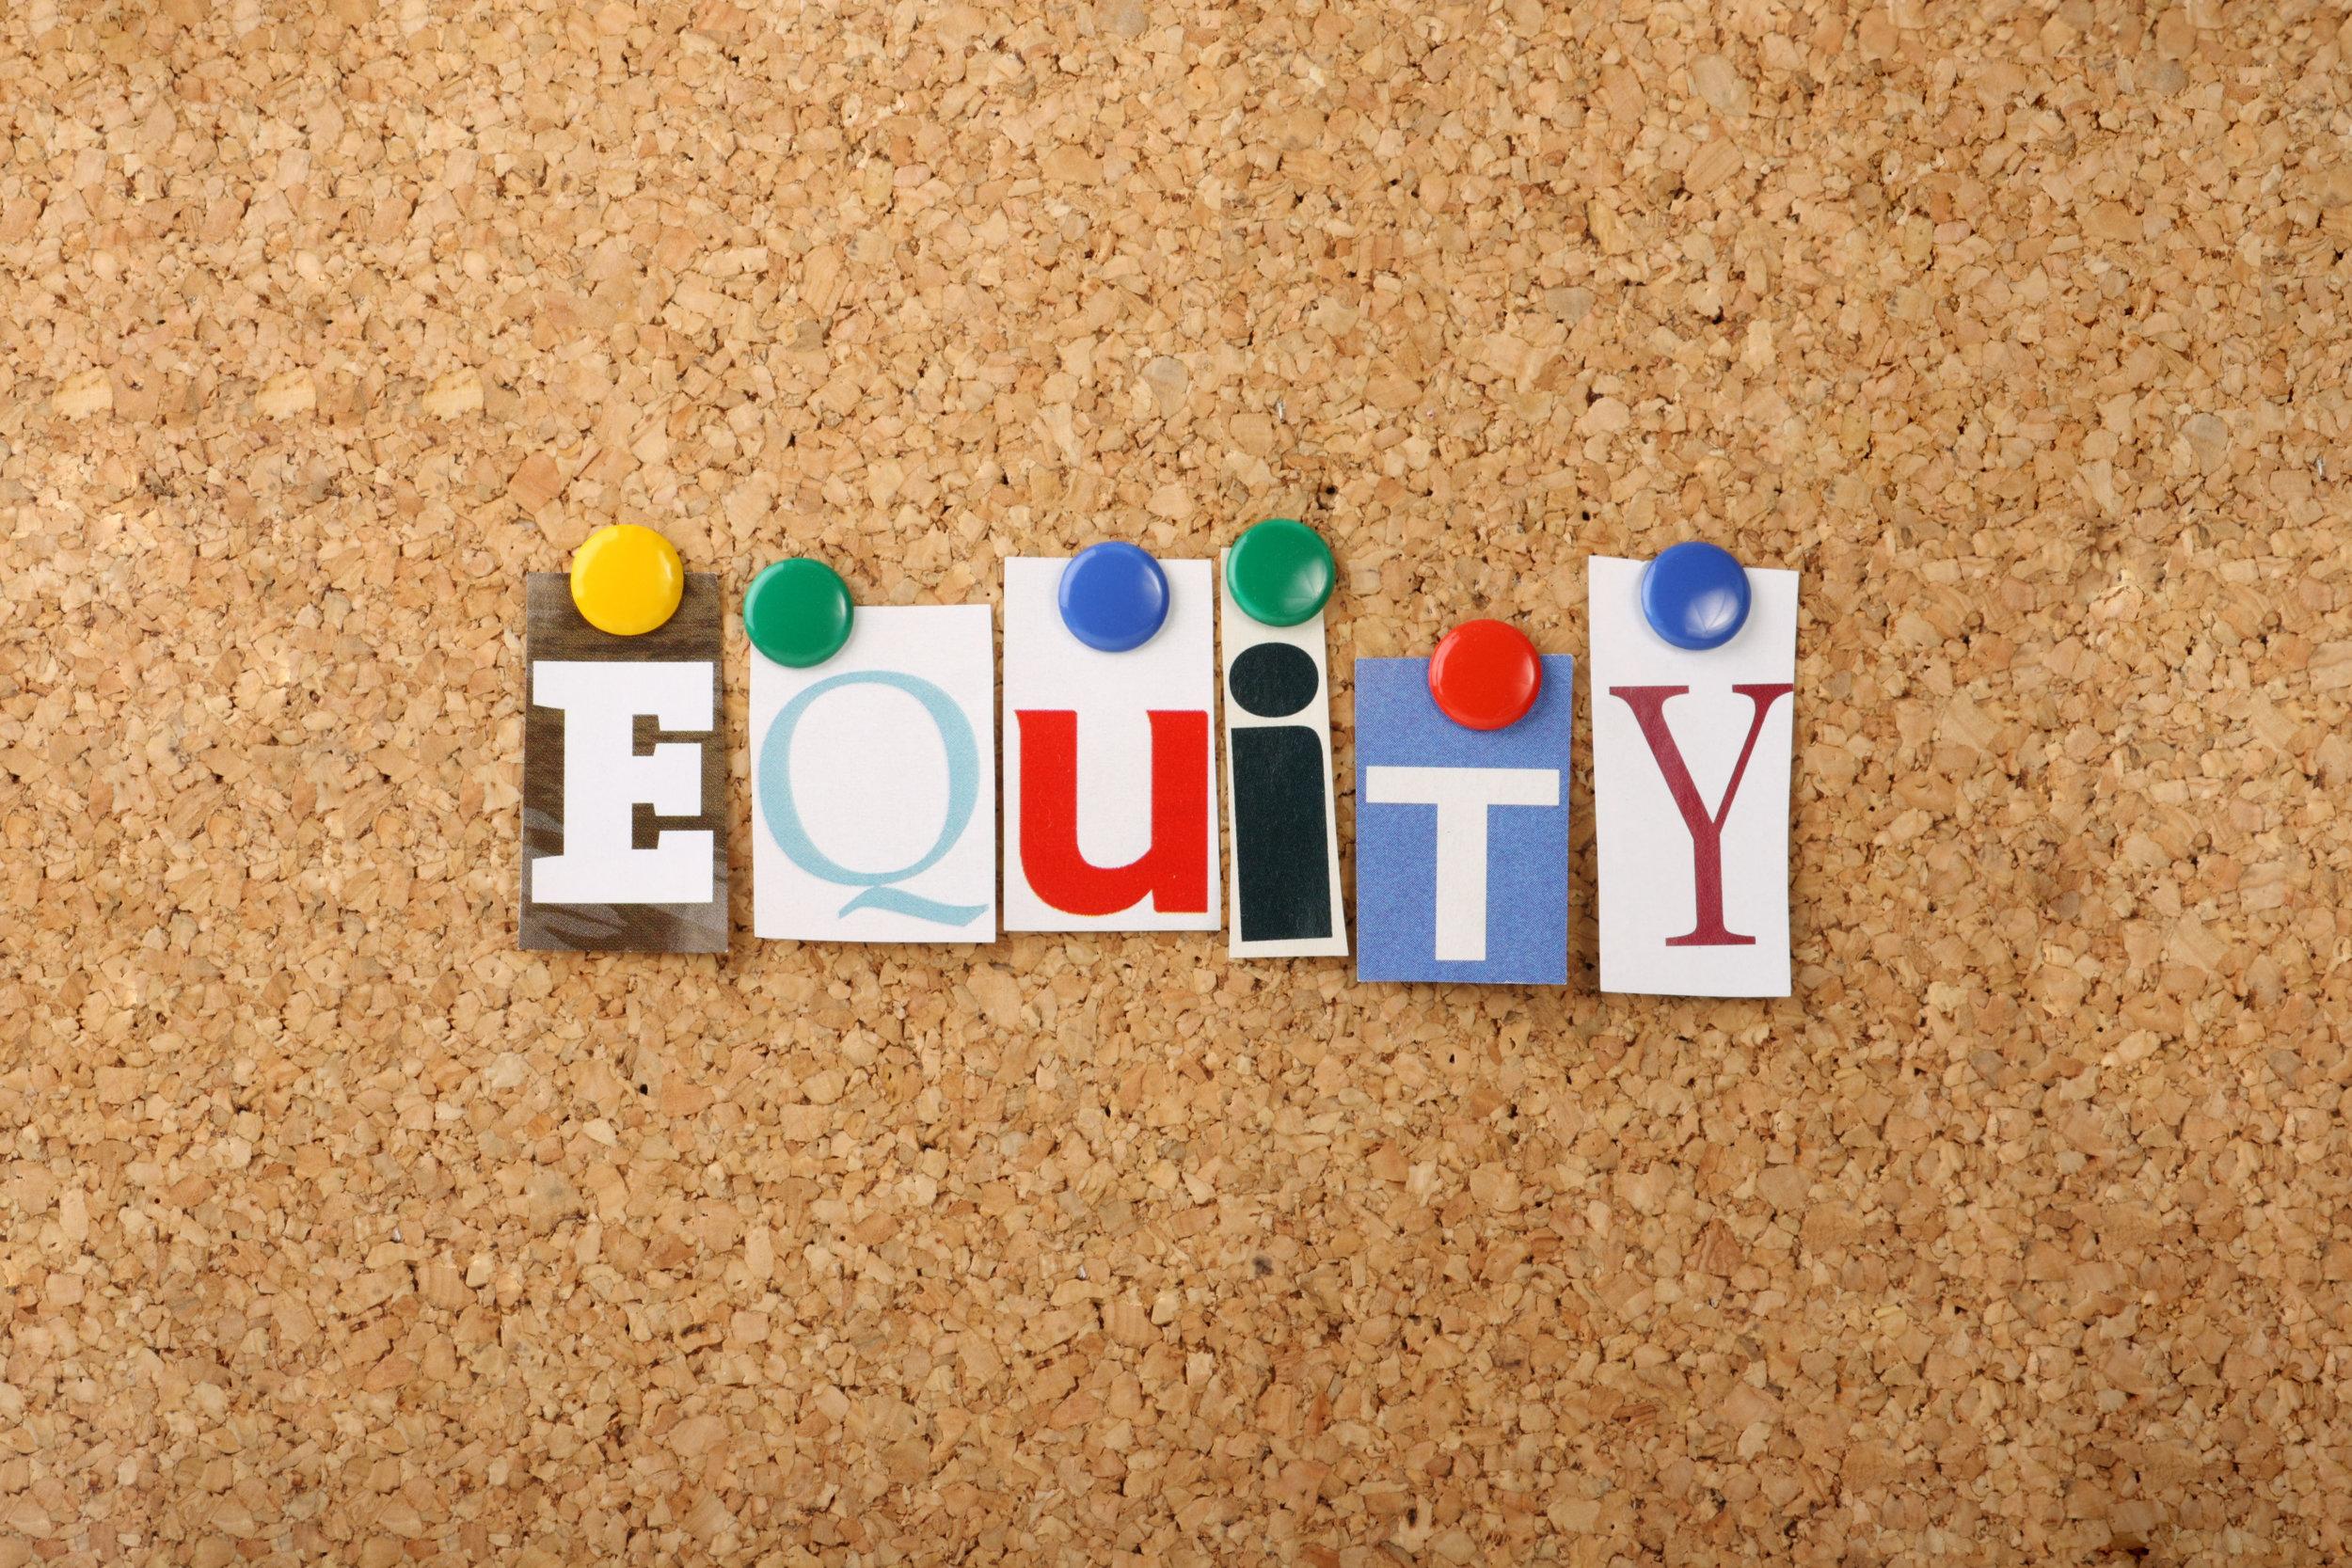 equity_flat_v2_Crop.jpg